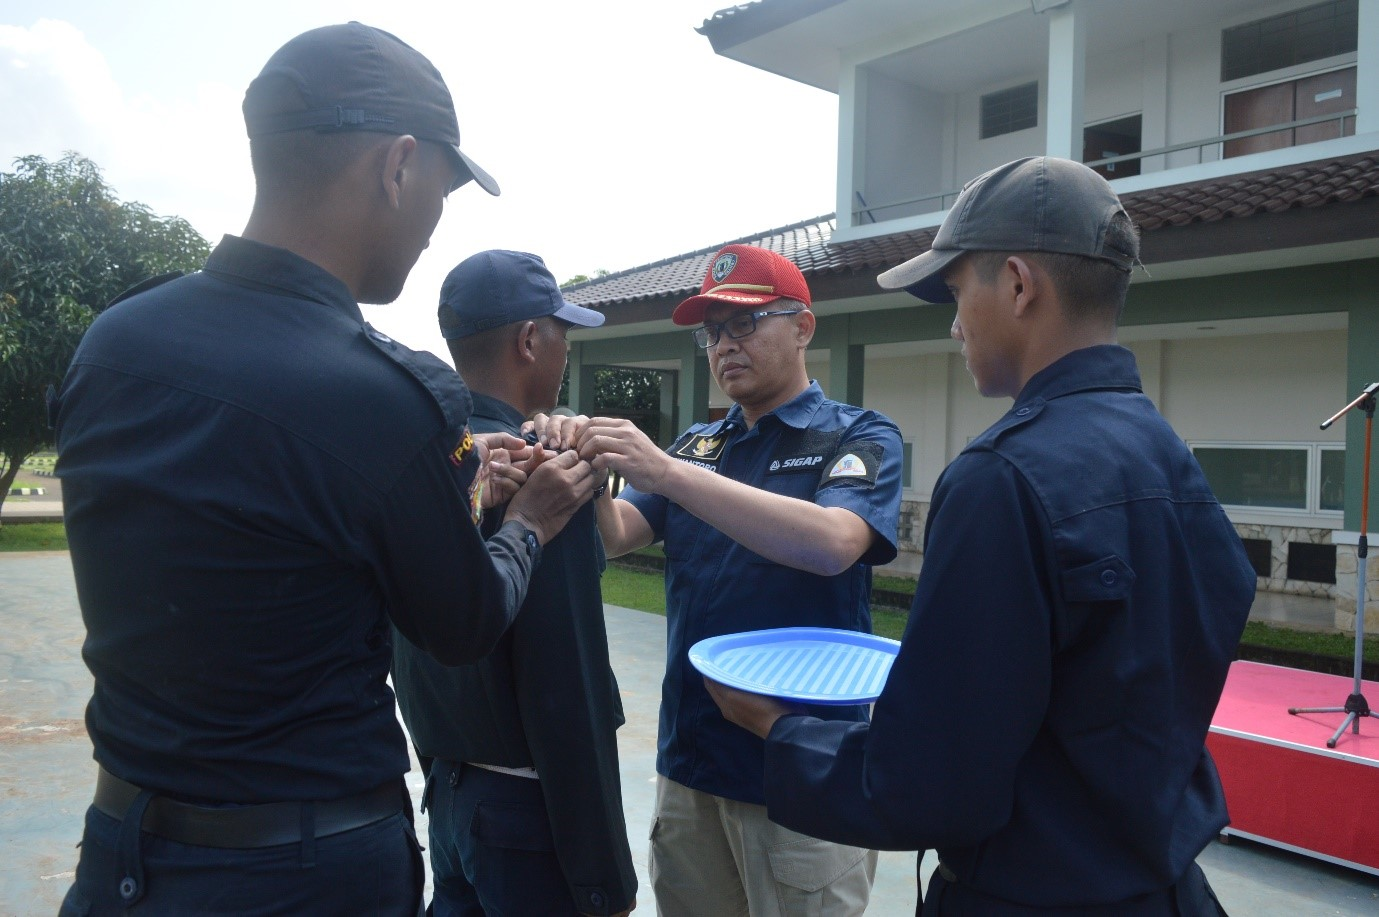 Pelepasan tanda siswa dan penyematan Pin Gada Pratama